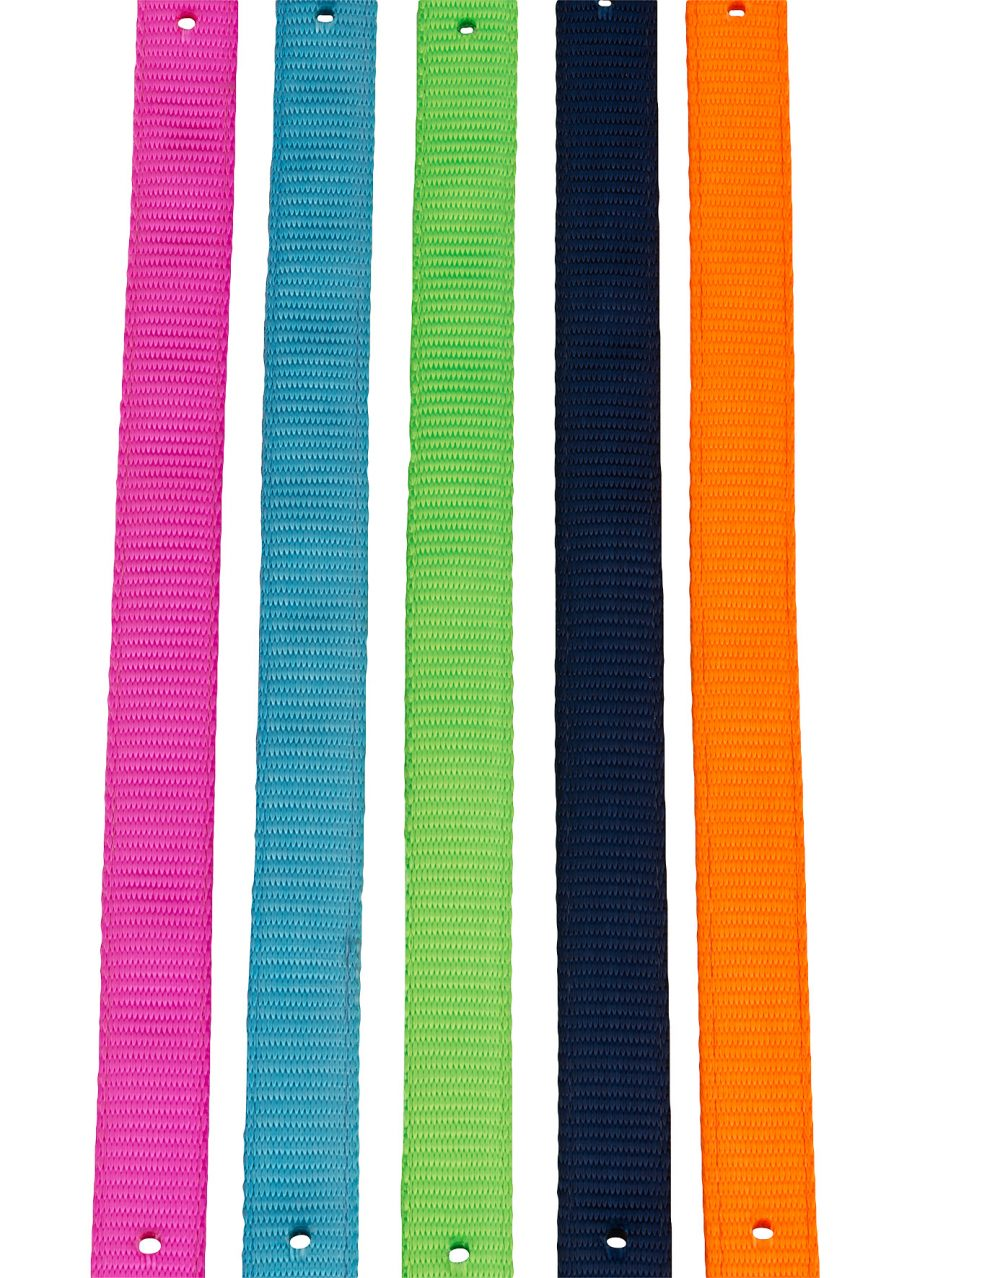 2404Grimma-nylon-färger-e1522921450369